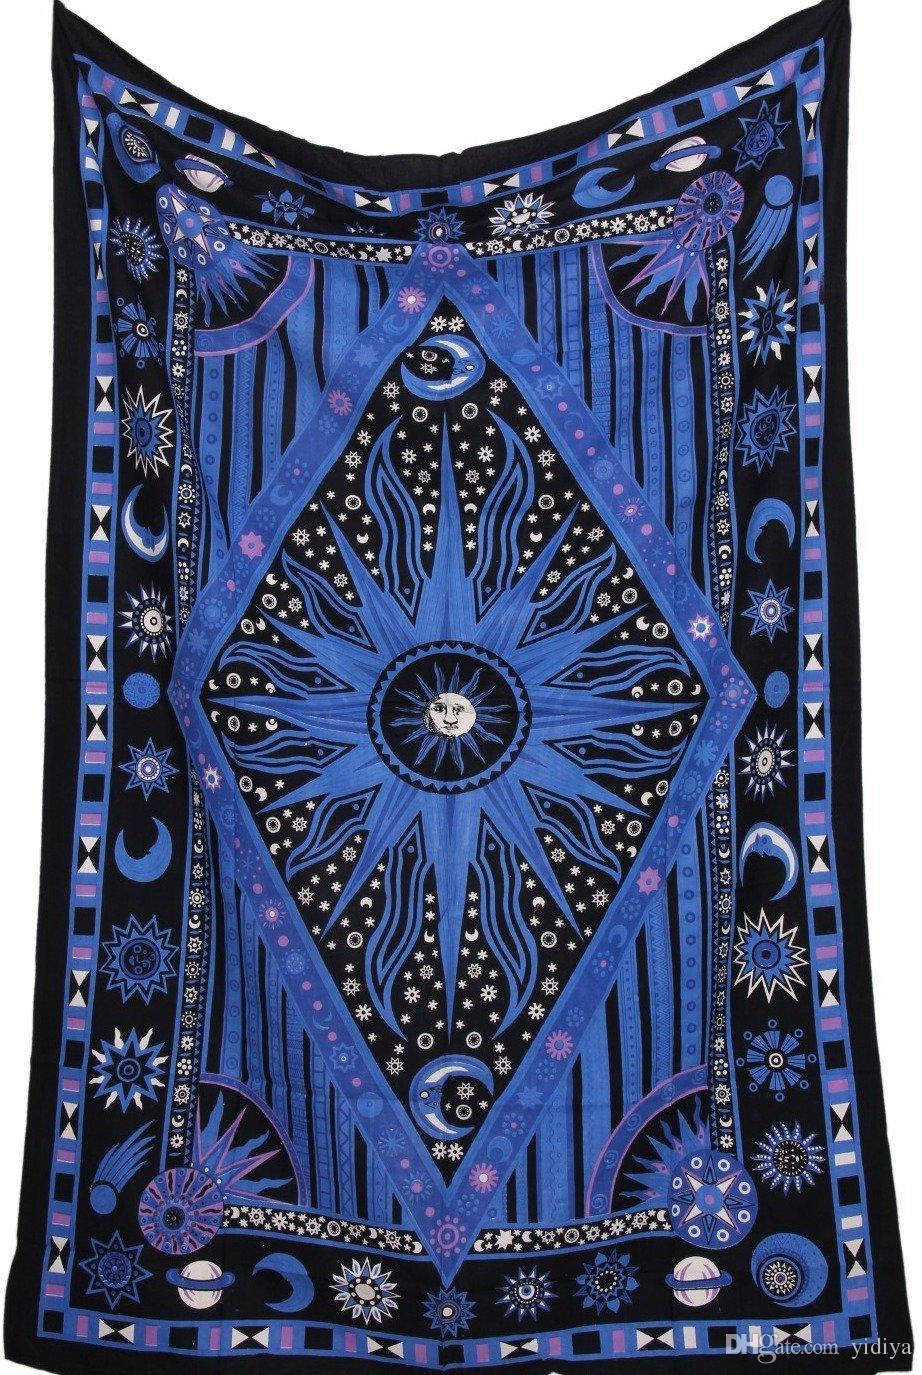 Azul sol y luna Mandala Tapiz Planeta Muro indio Tapiz Tapiz Plaza y Rombo Tapiz Mandalas Tapicería Tippie